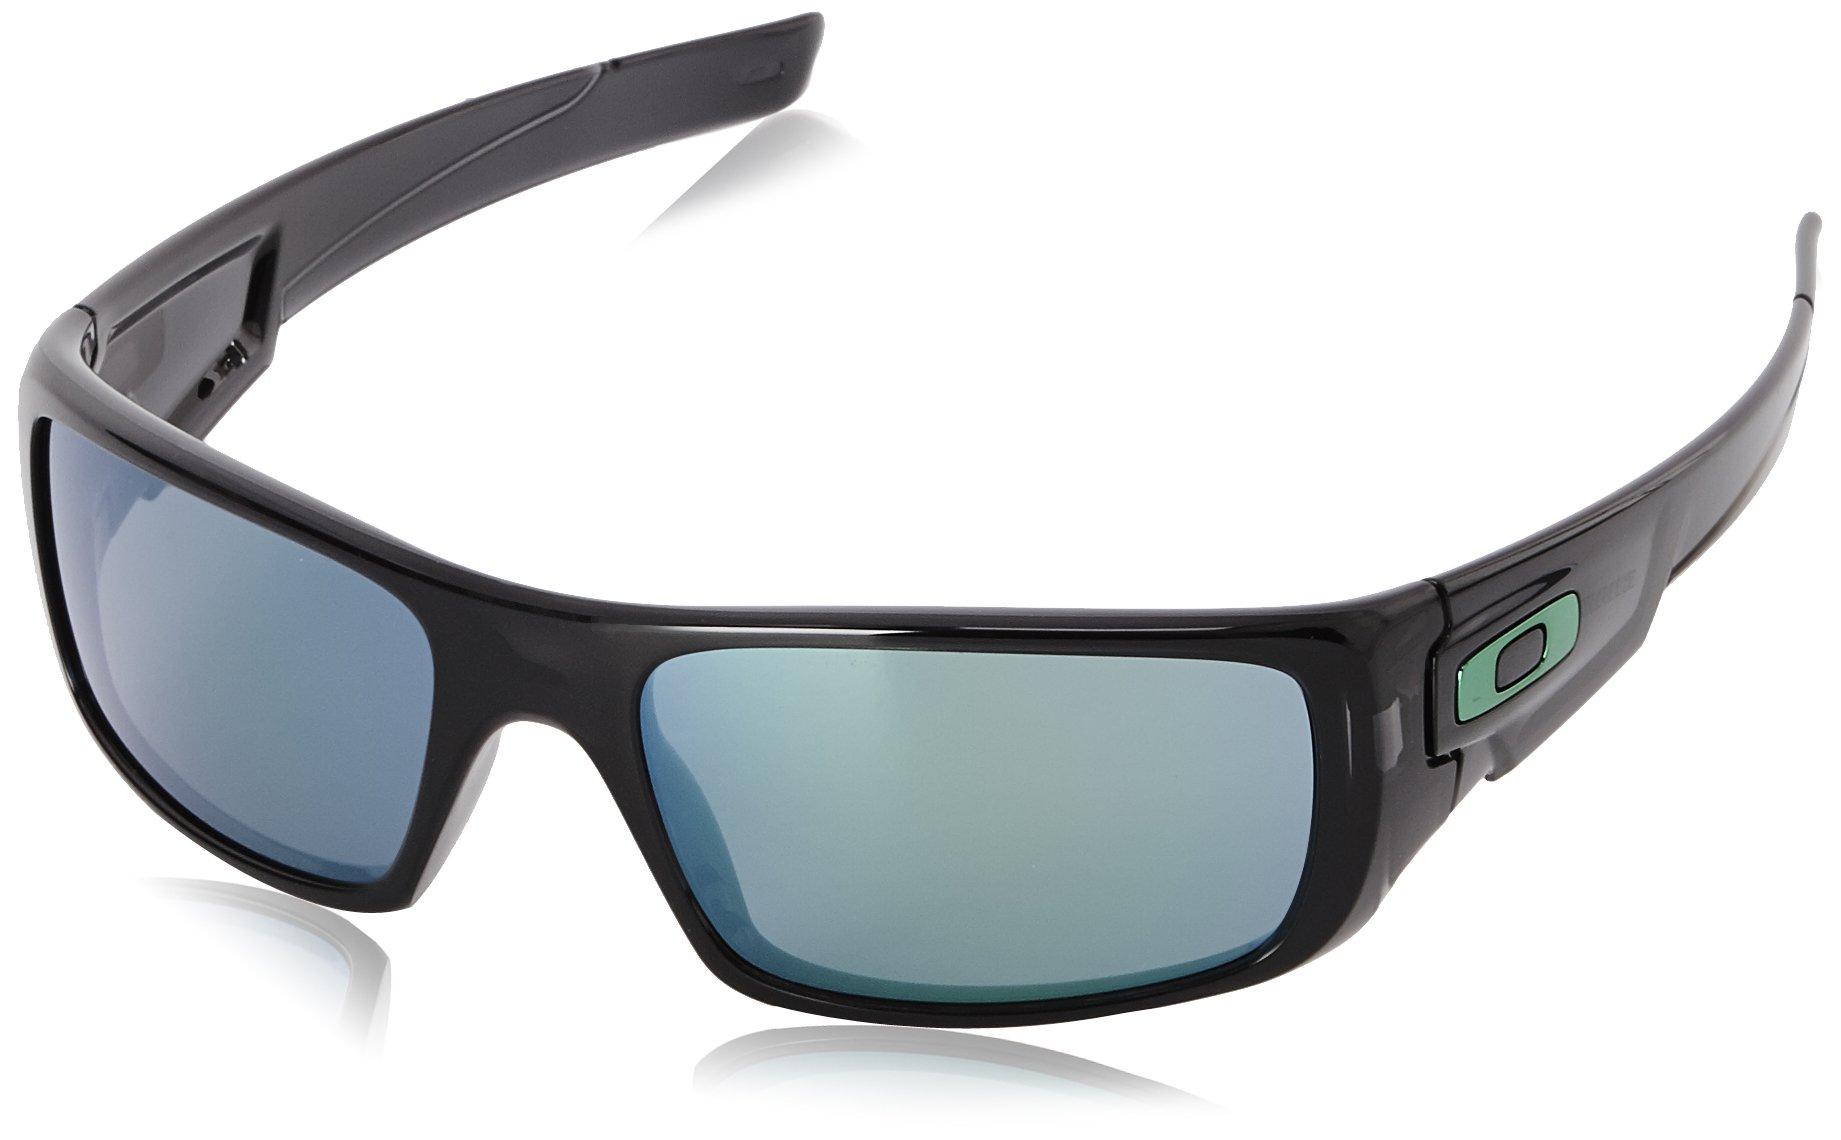 Oakley Mens Crankshaft Sunglasses, Black Ink/Jade Iridium, One Size